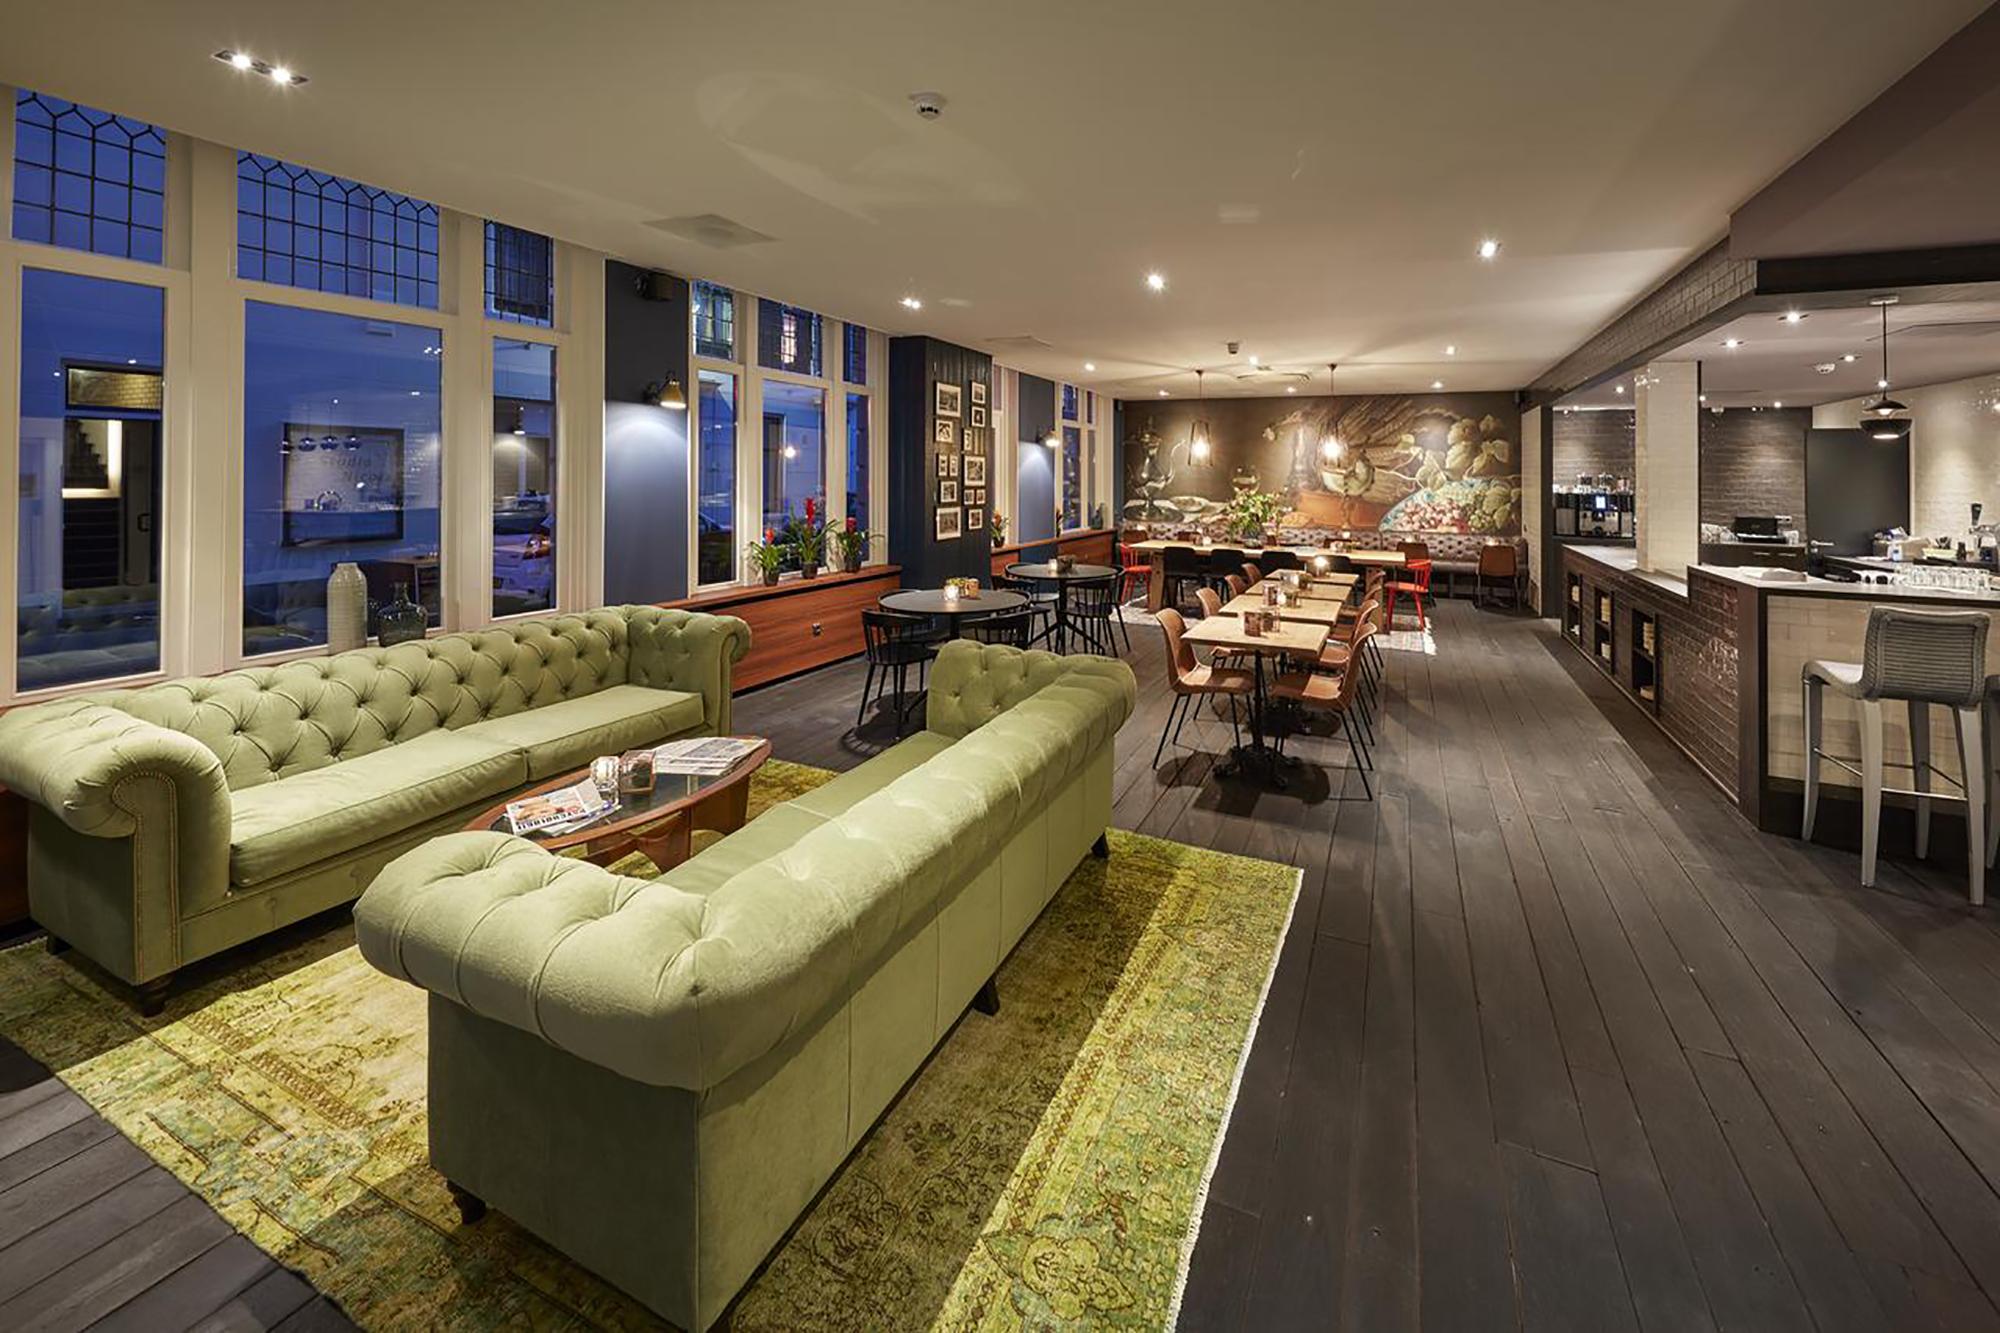 Hotel Lion D'Or in Haarlem